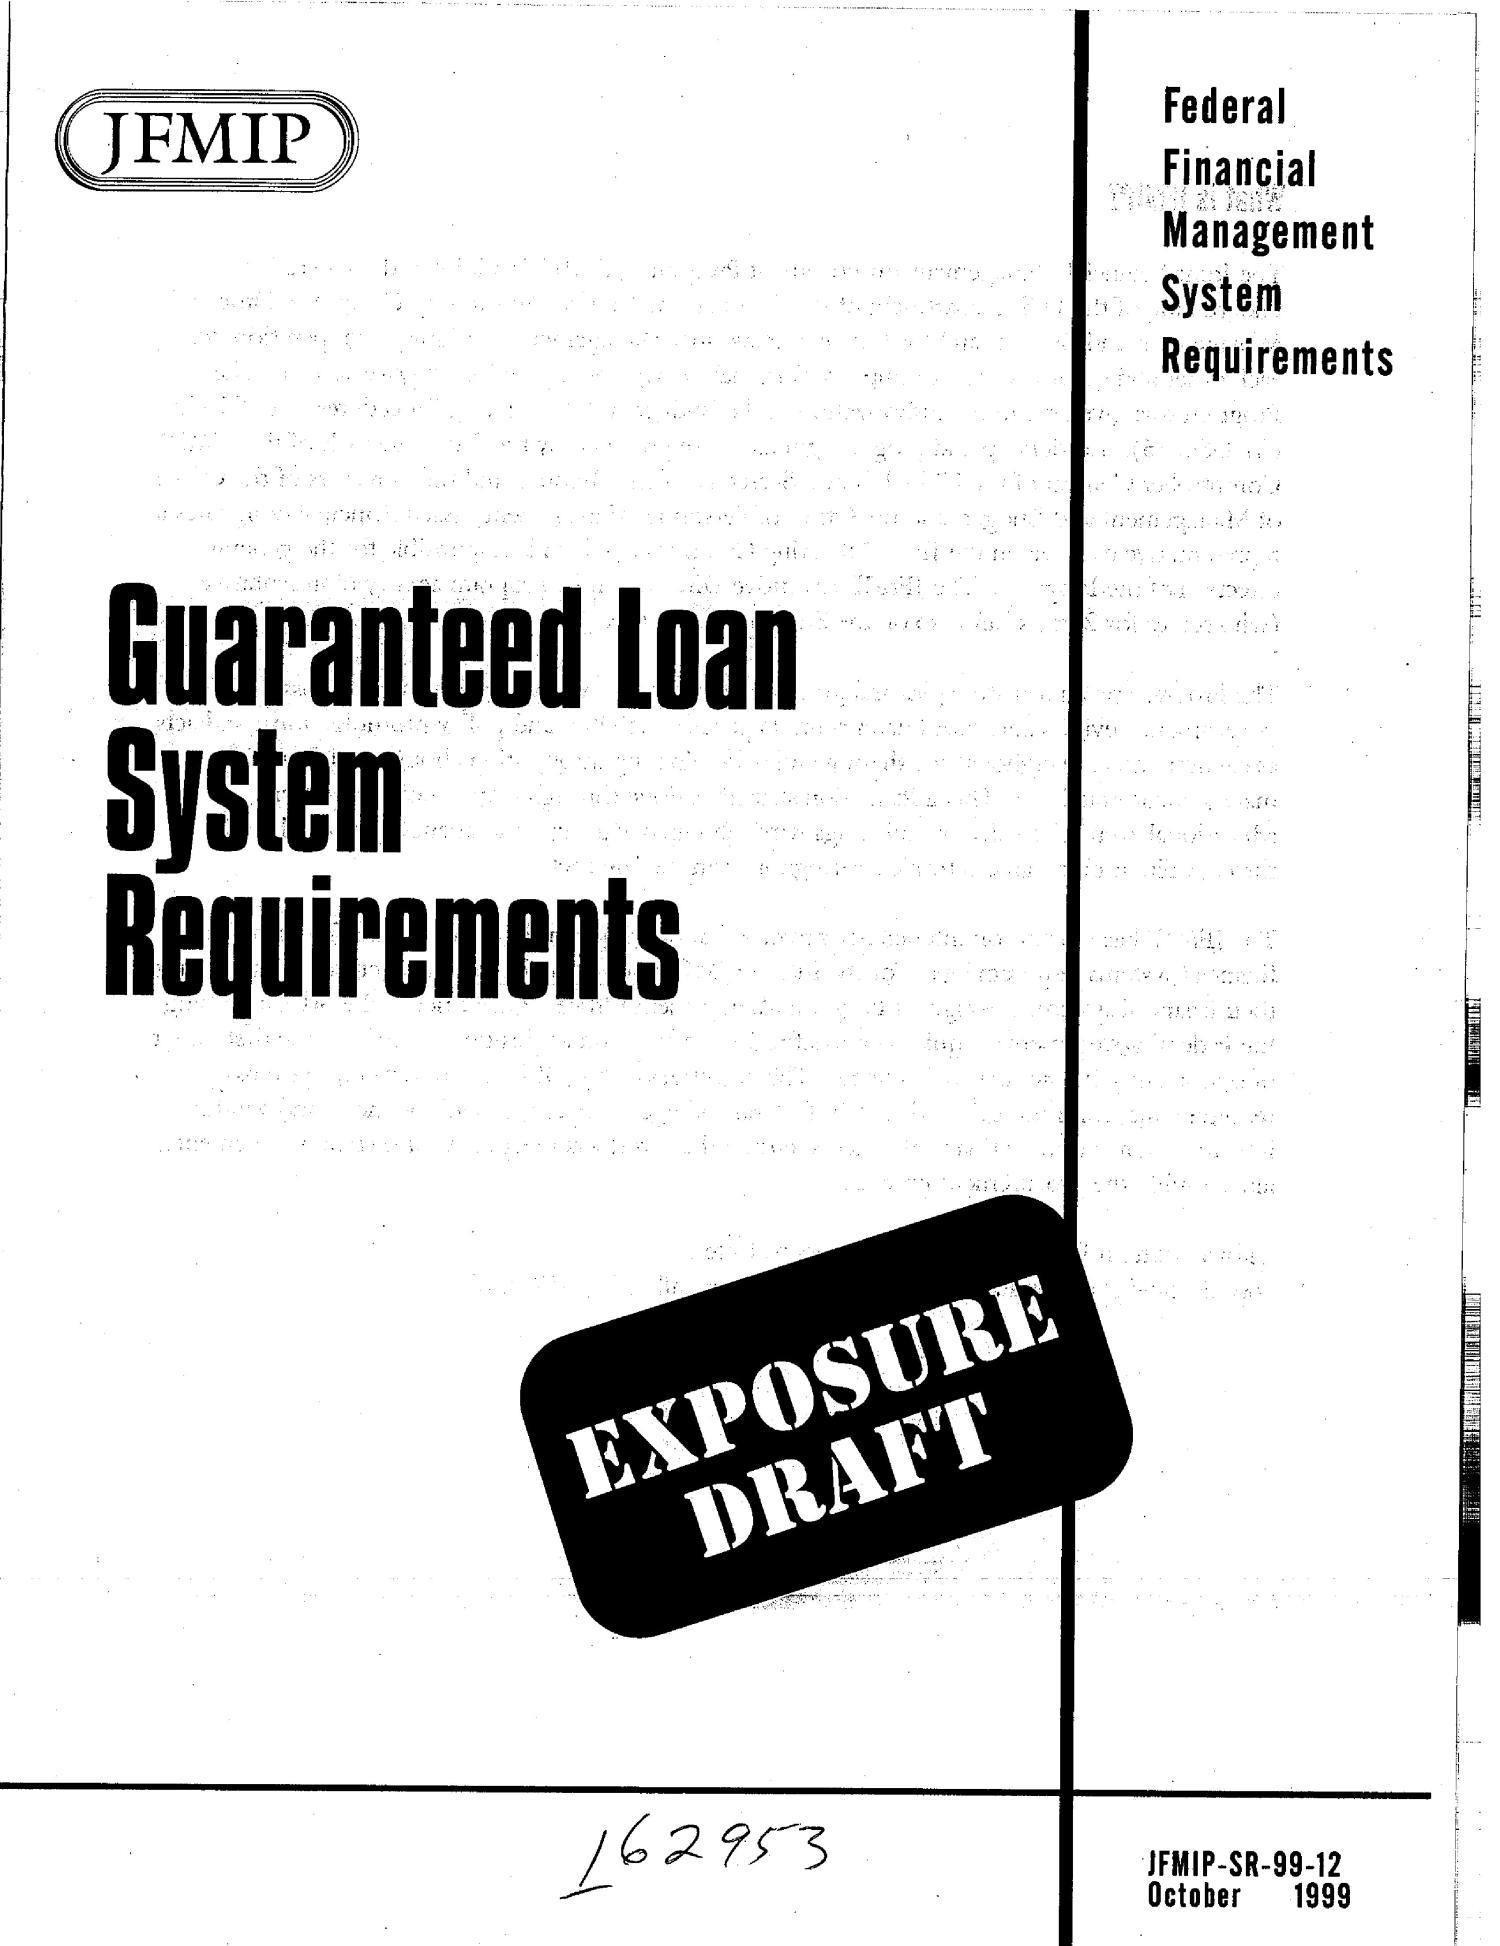 Guaranteed Loan System Requirements (Exposure Draft